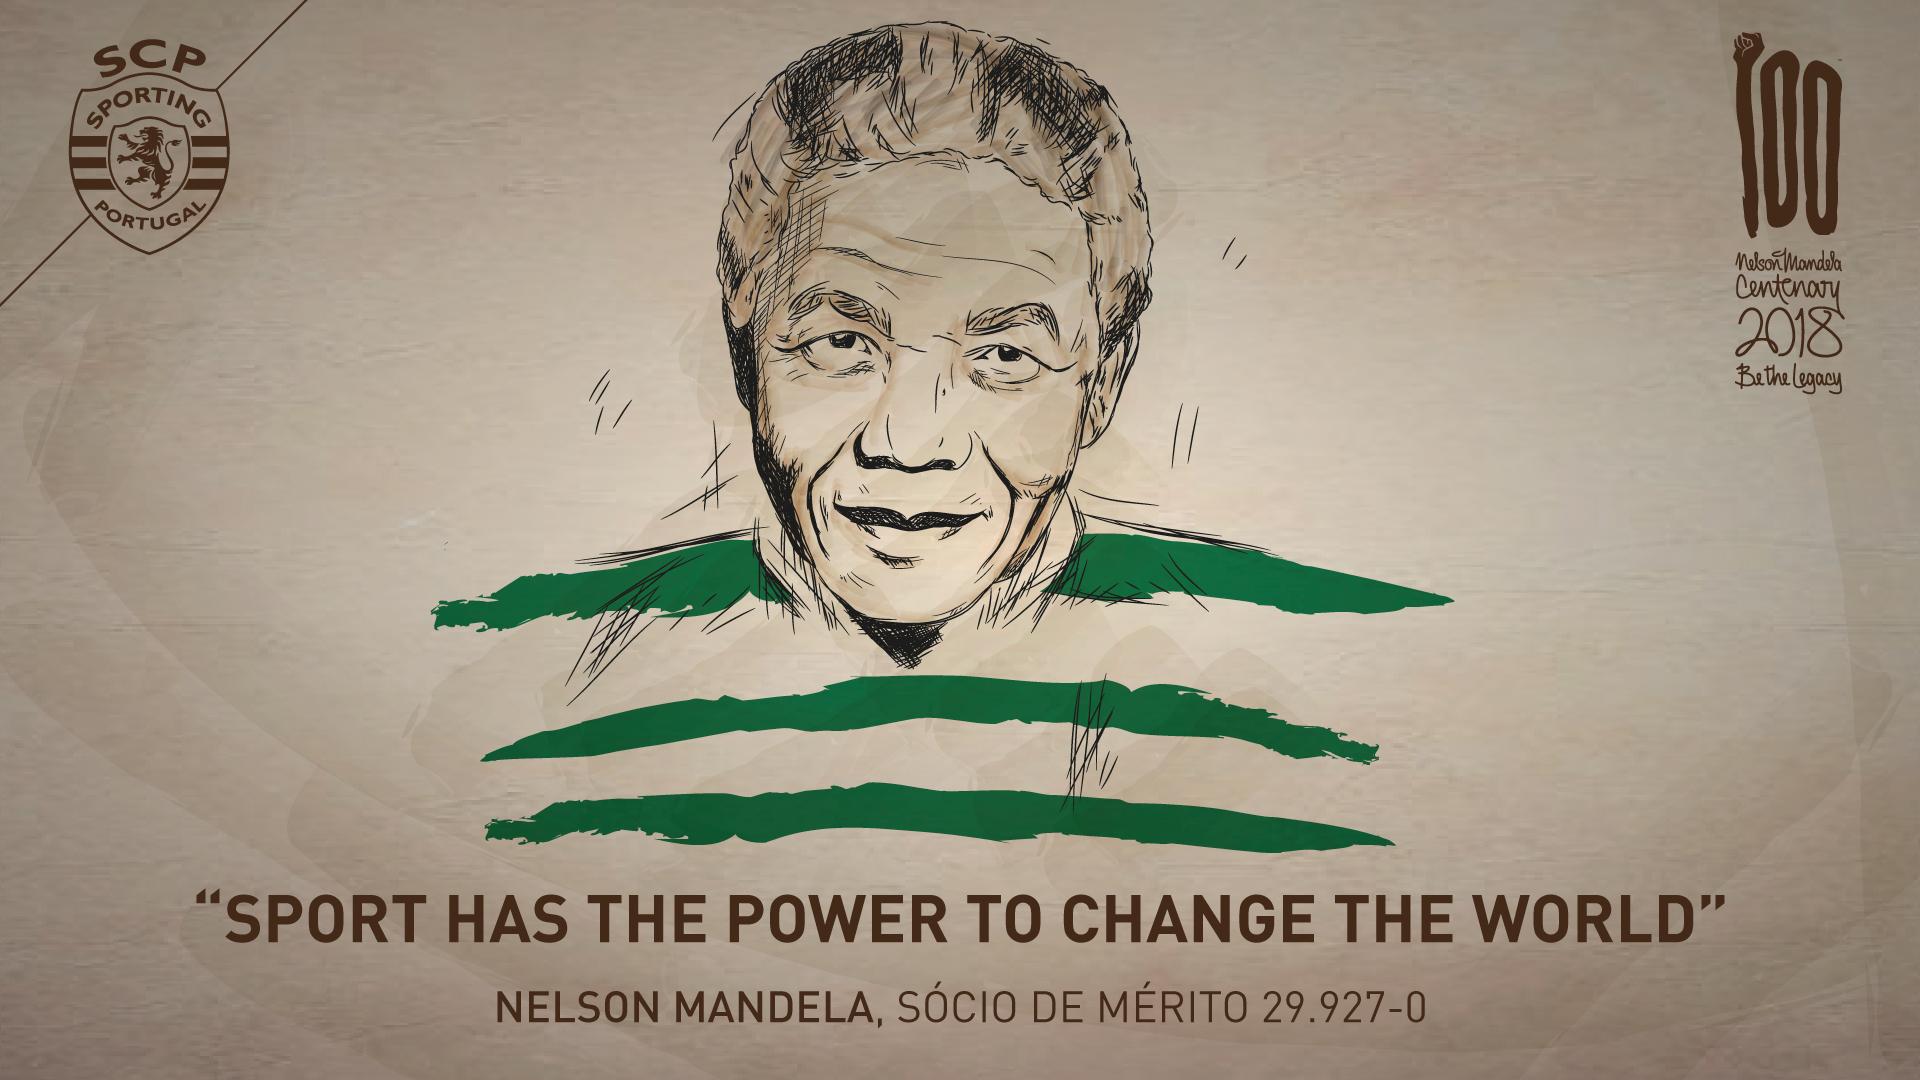 https://scpconteudos.pt/sites/default/files/revslider/image/Mandela-TV.JPG